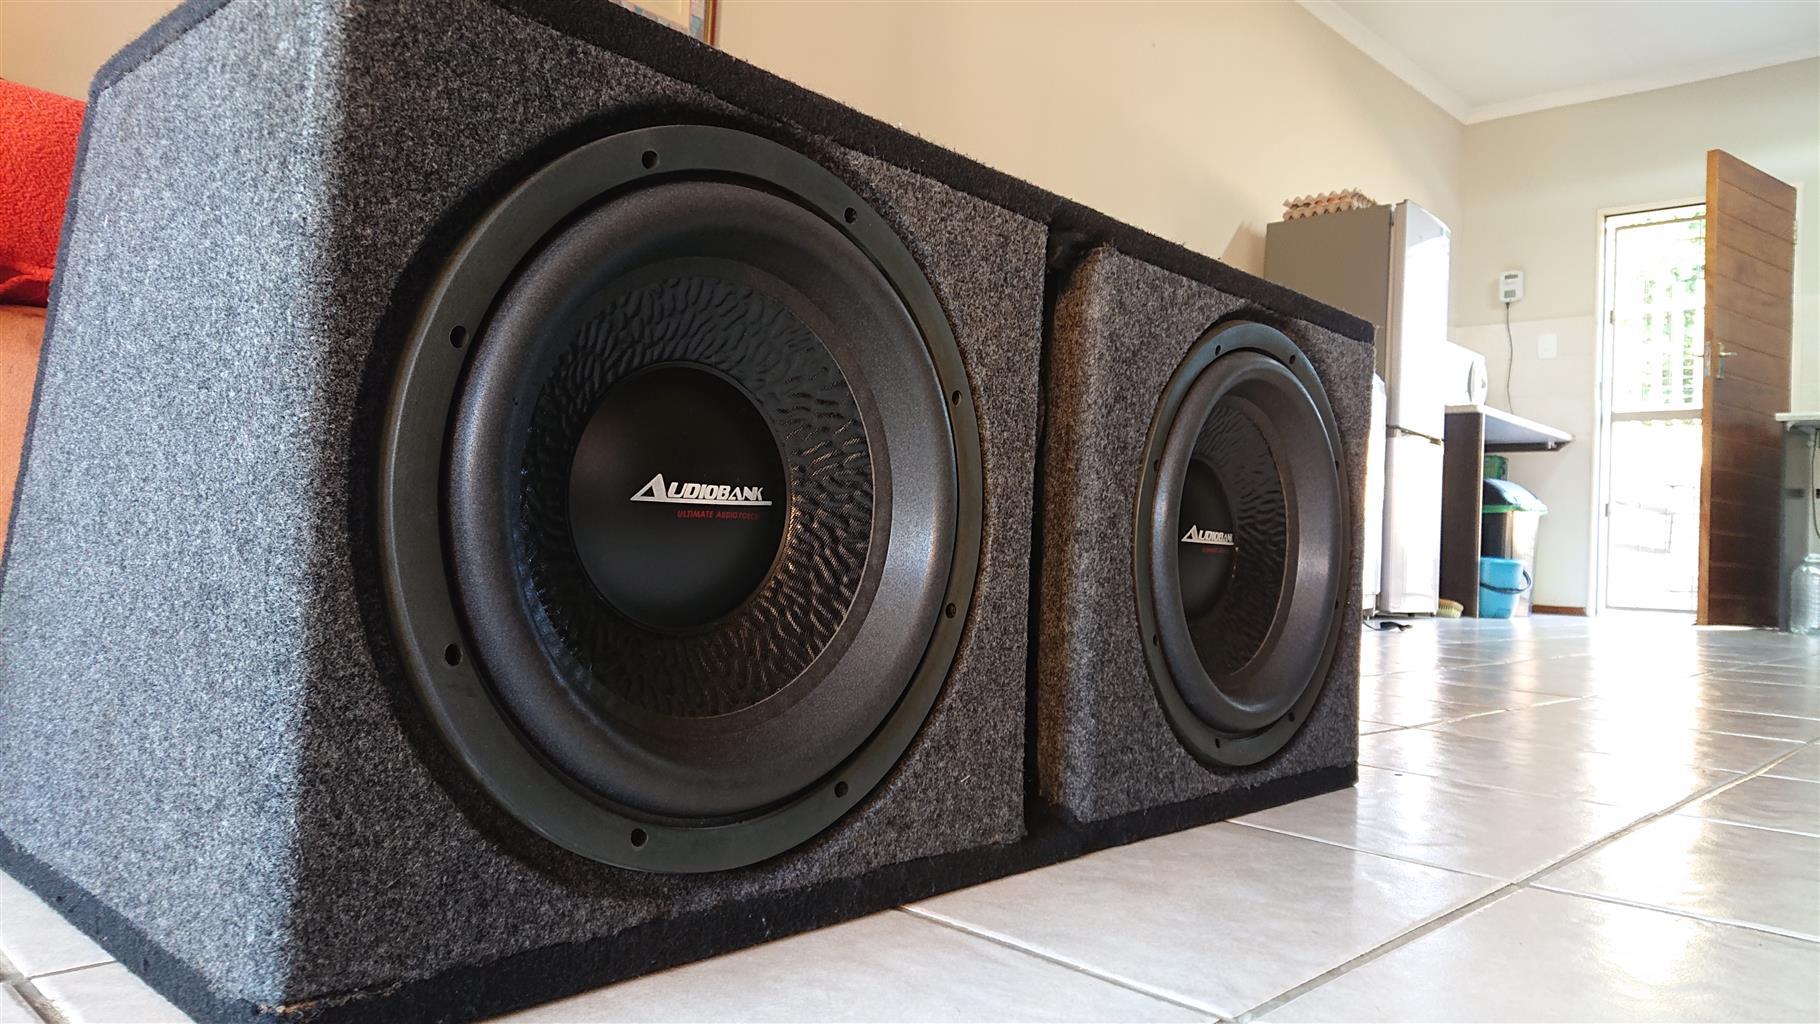 12 Audiobank Subwoofers